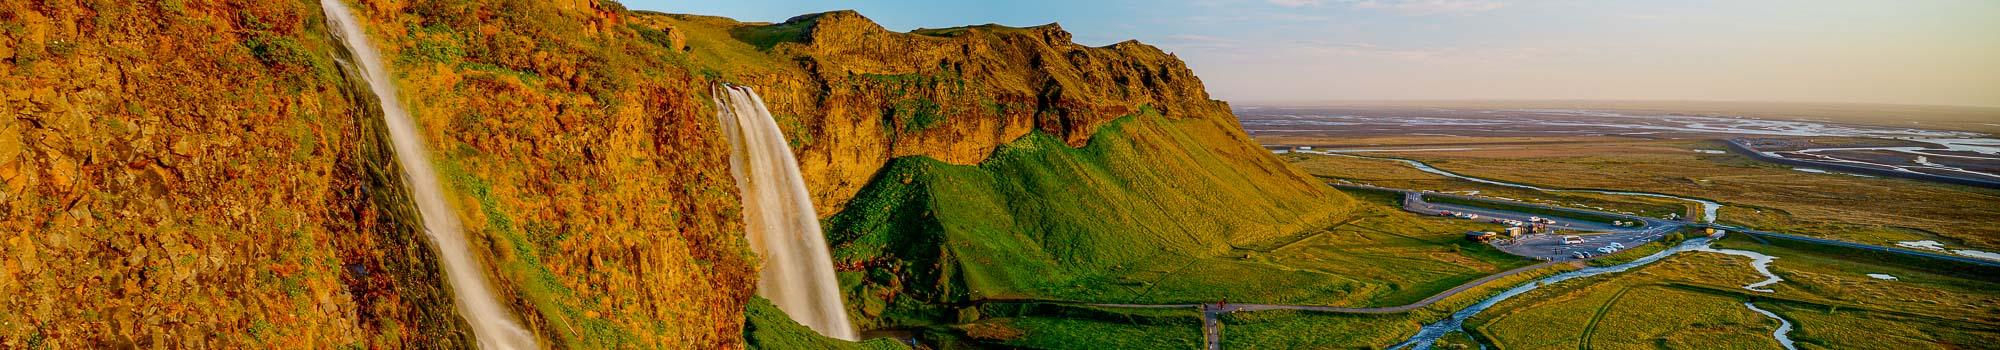 Seljalandsfoss waterfall panorama